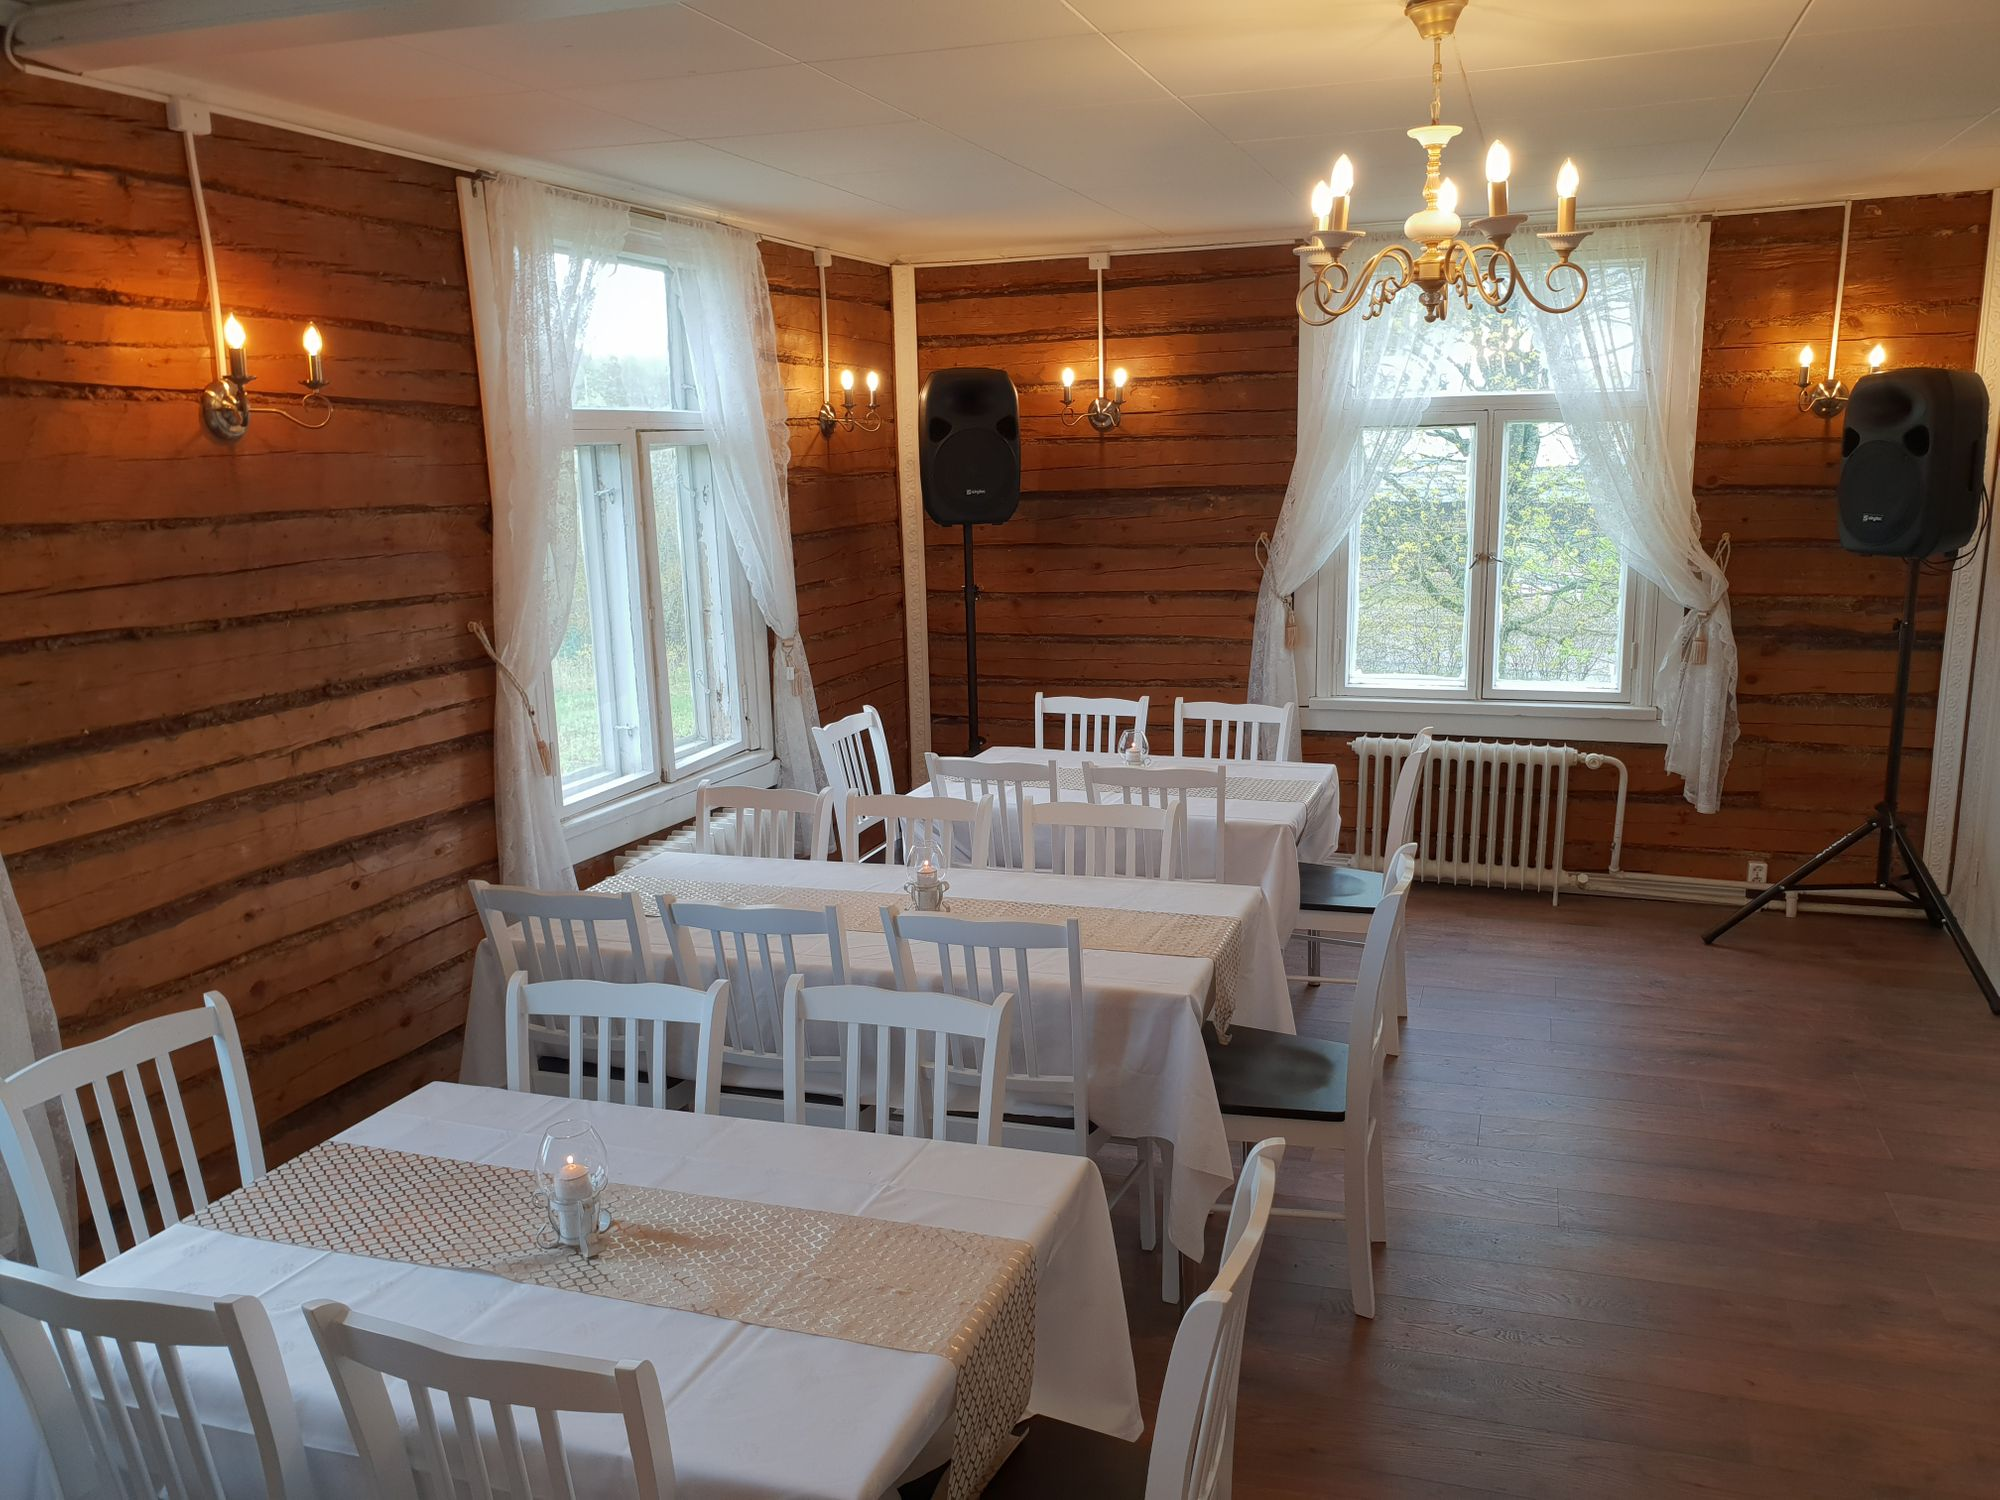 Villa Hannus - tila synttäreille / Venuu.fi